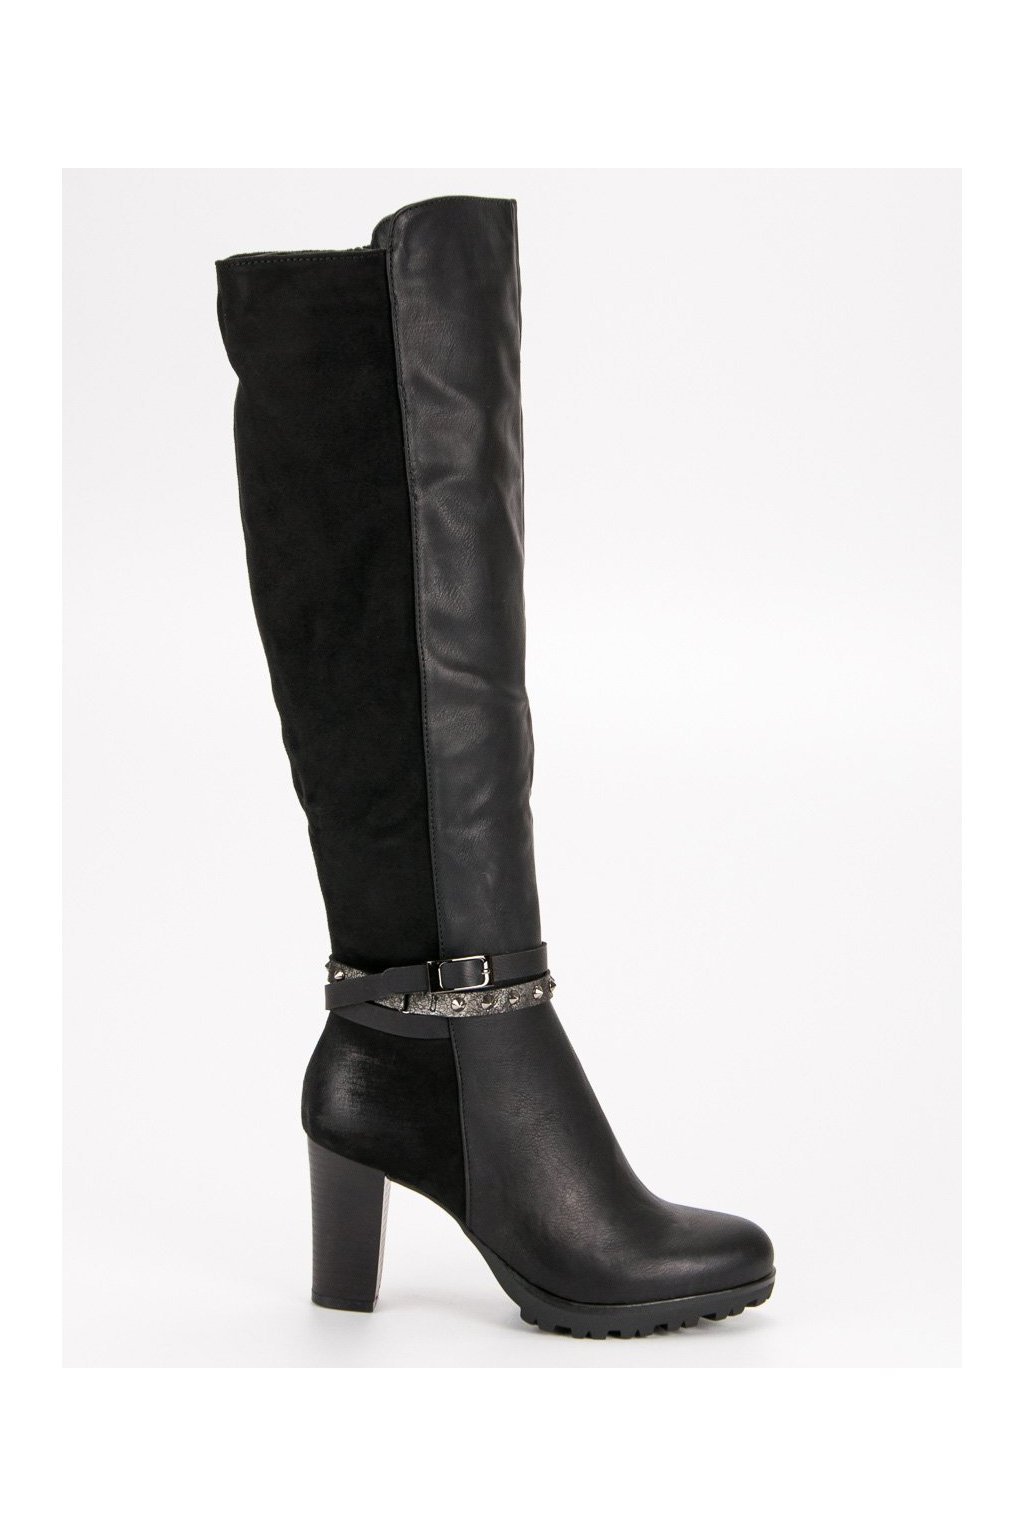 bb77010d7a6b7 Čierne zimné topánky | NAJ.SK